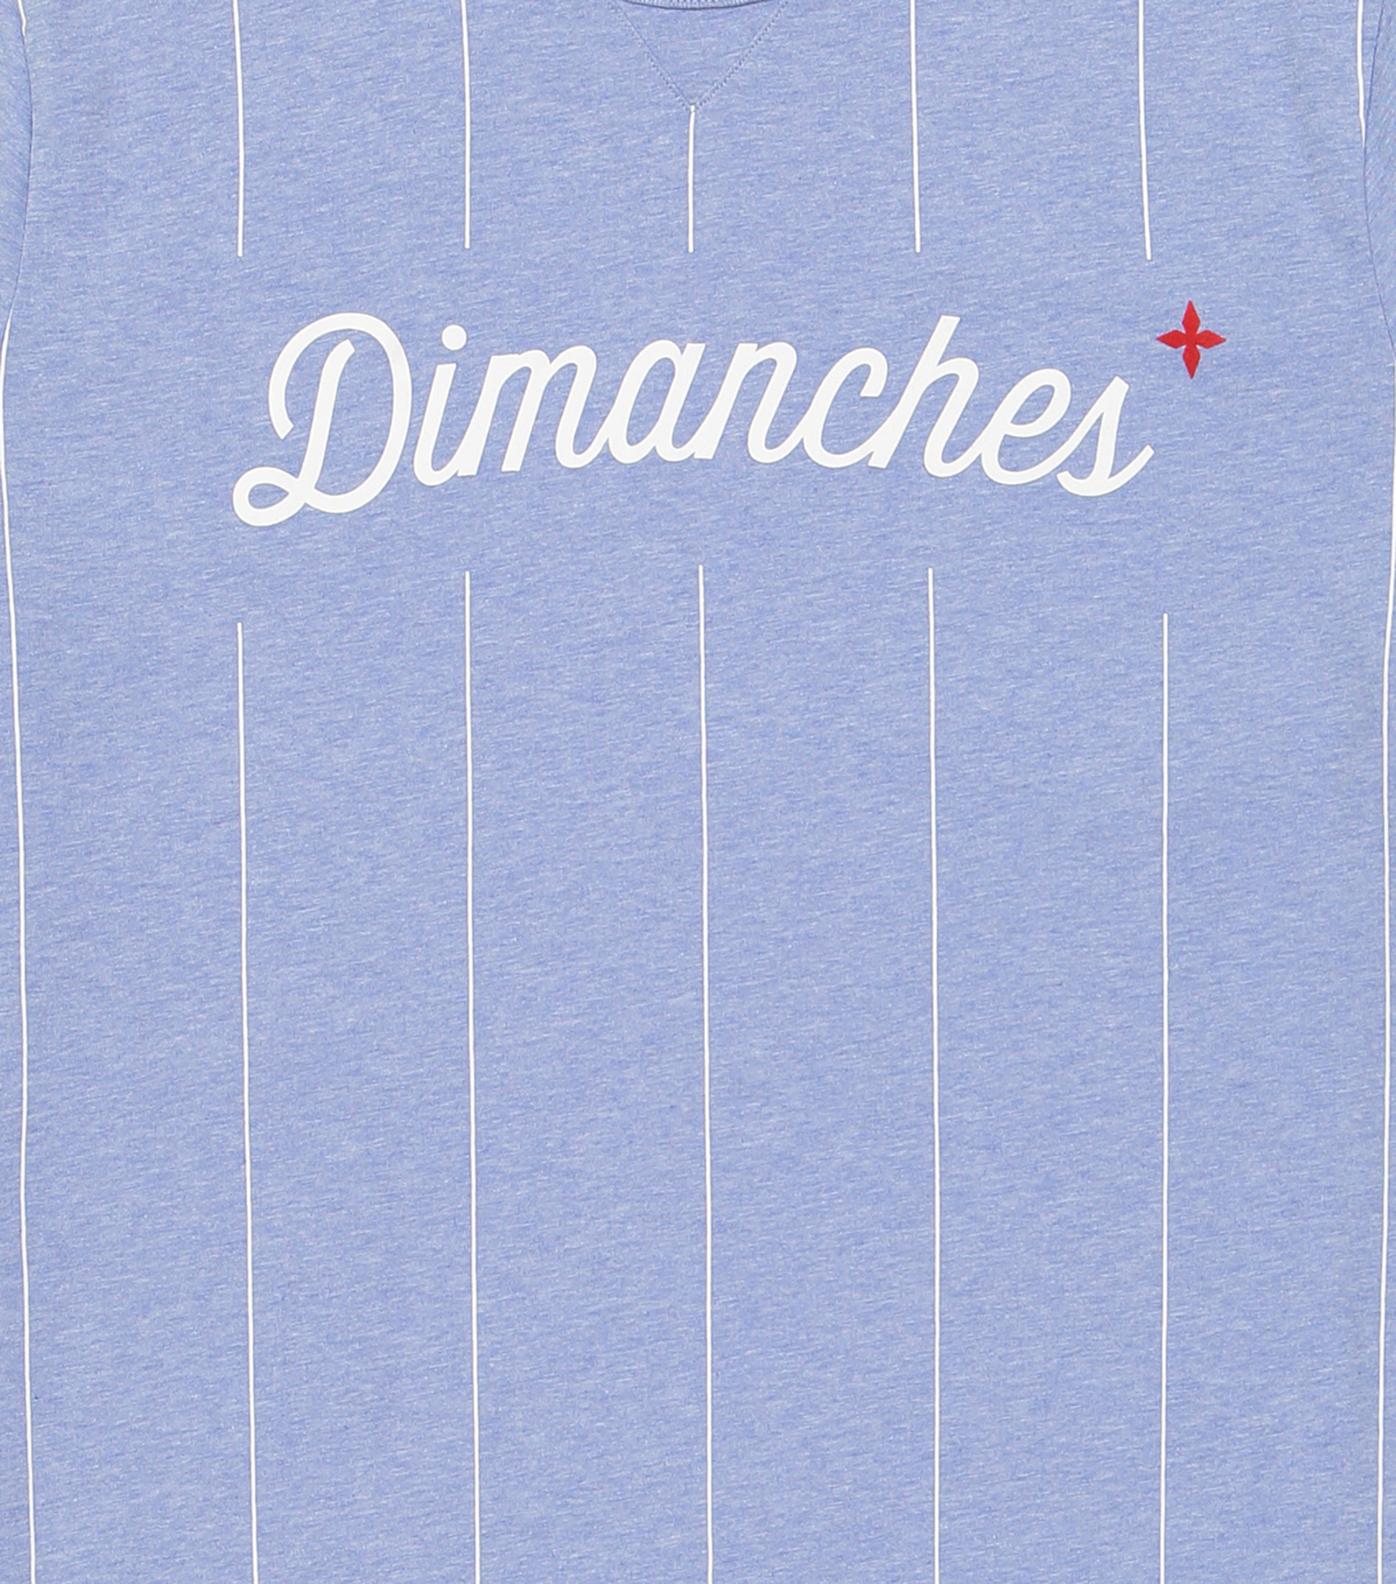 TEE DIMANCHES03 - Bleu chine